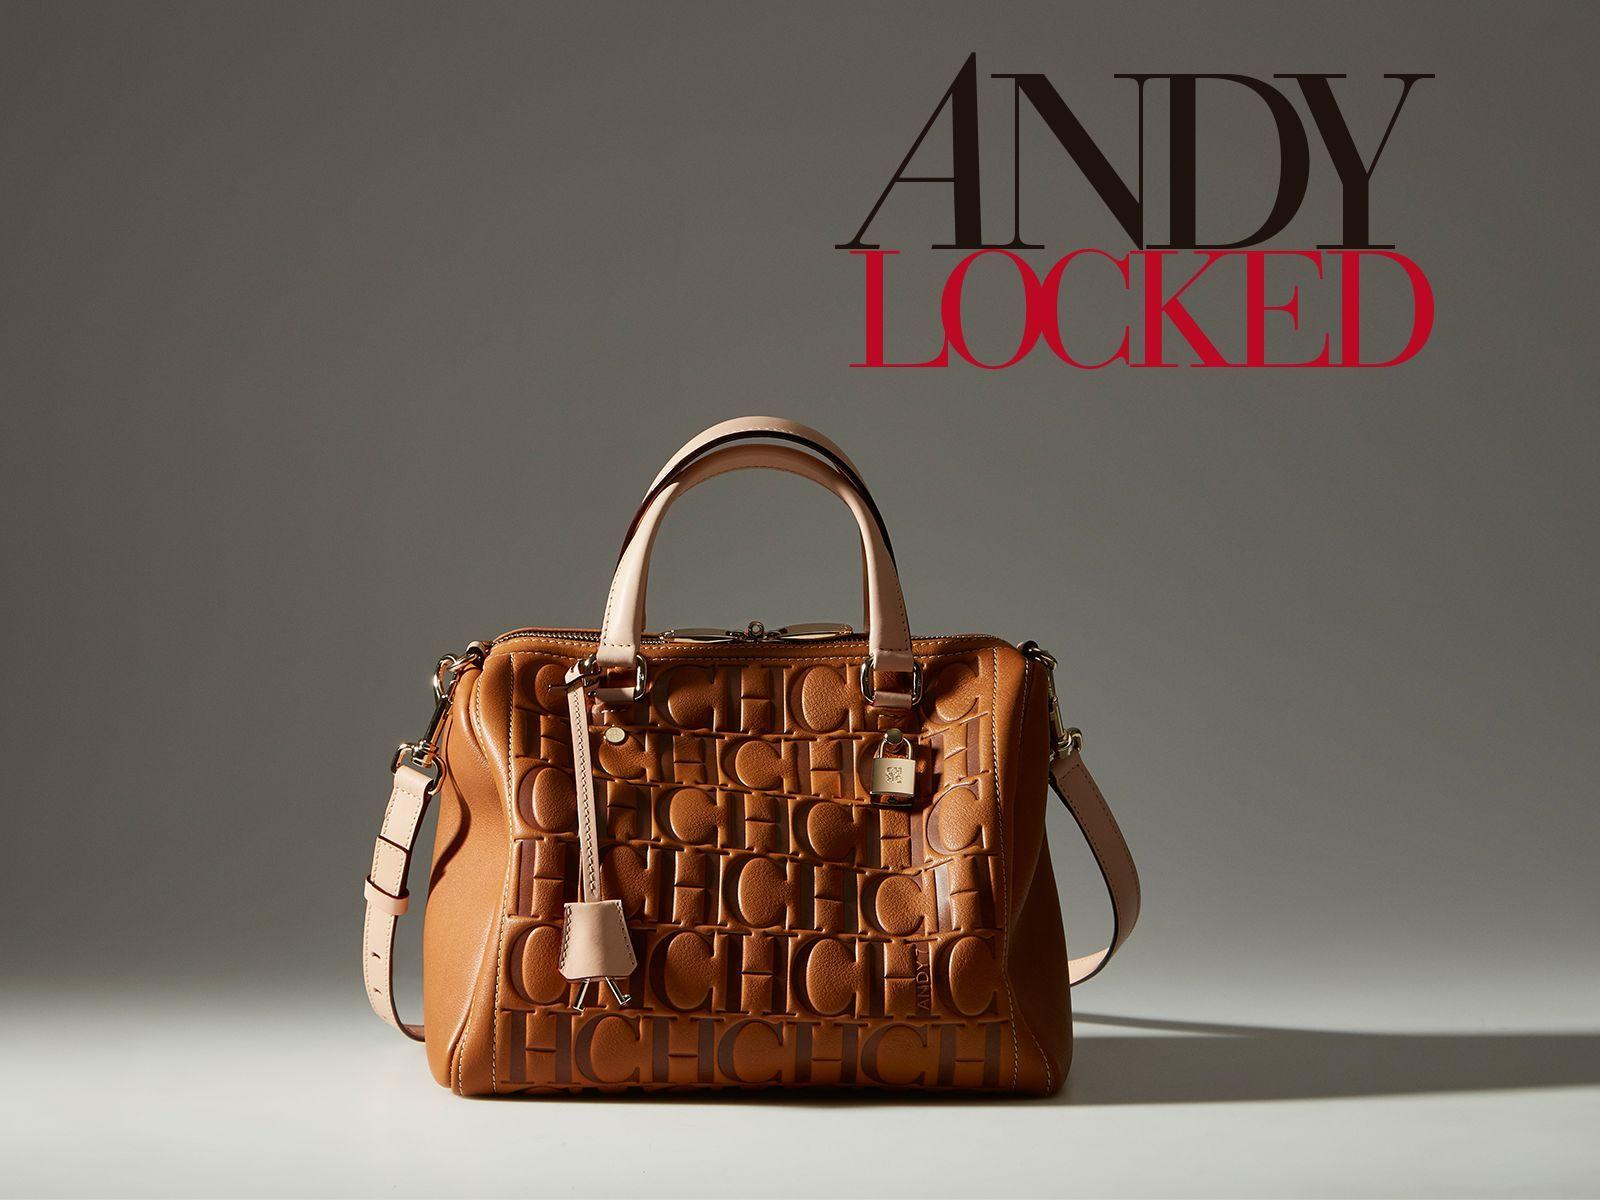 Andy 7 Locked | Medium bowling bag